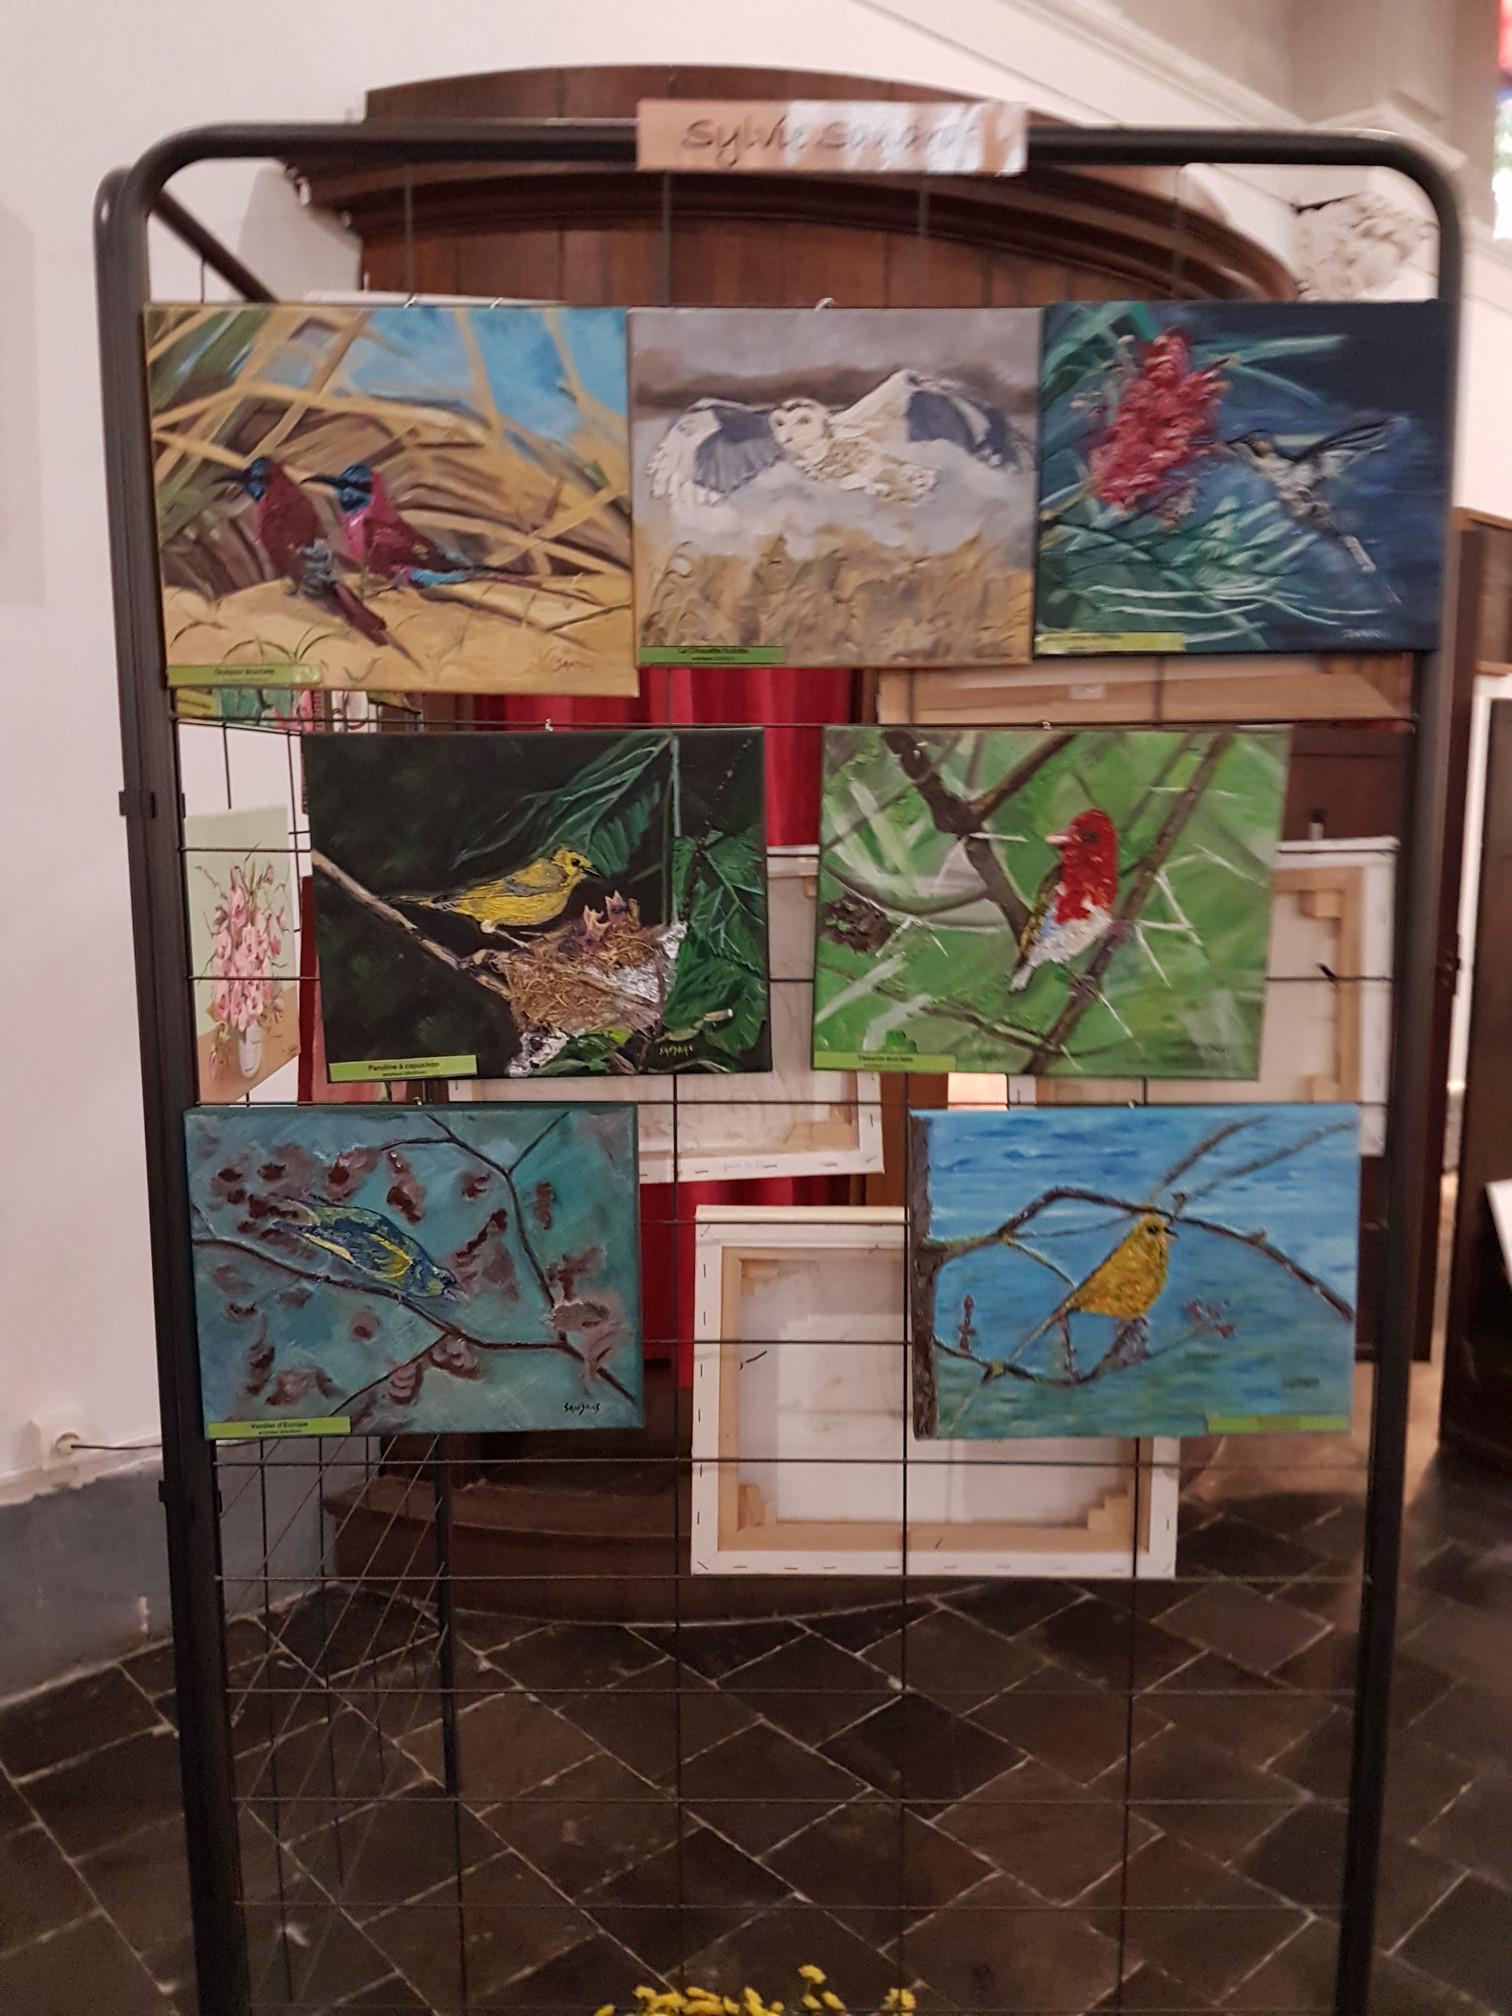 exposition_peintures_sandras_2020_17